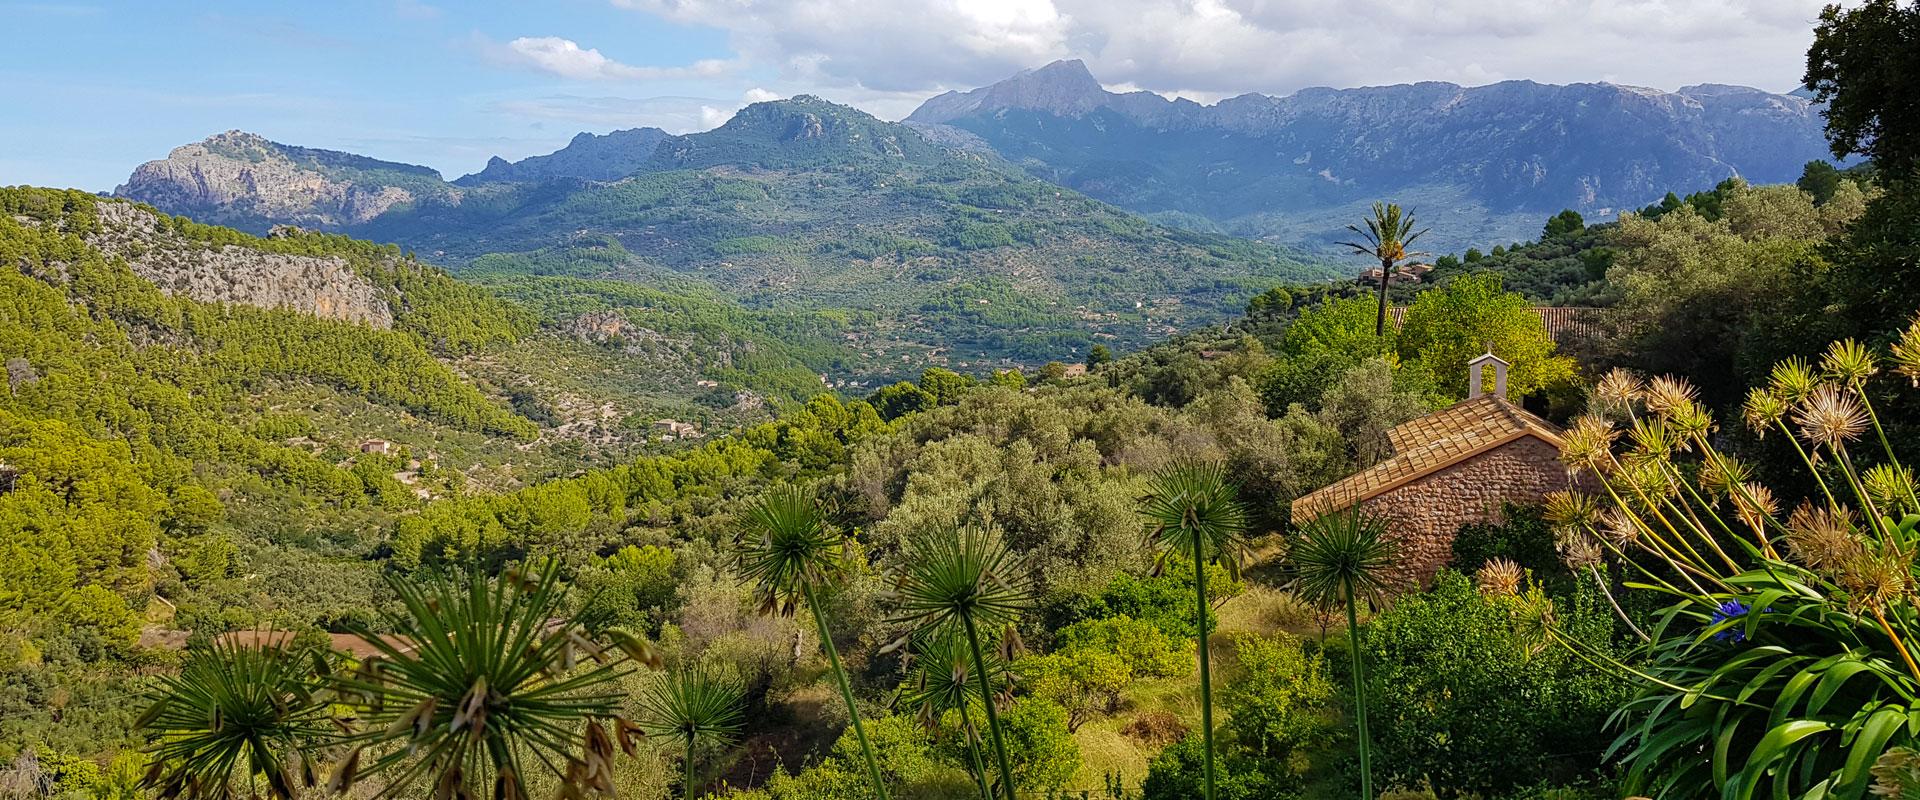 Vandring Pa Mallorca Wild Rover Travel Dk Vandring Pa Egen Hand